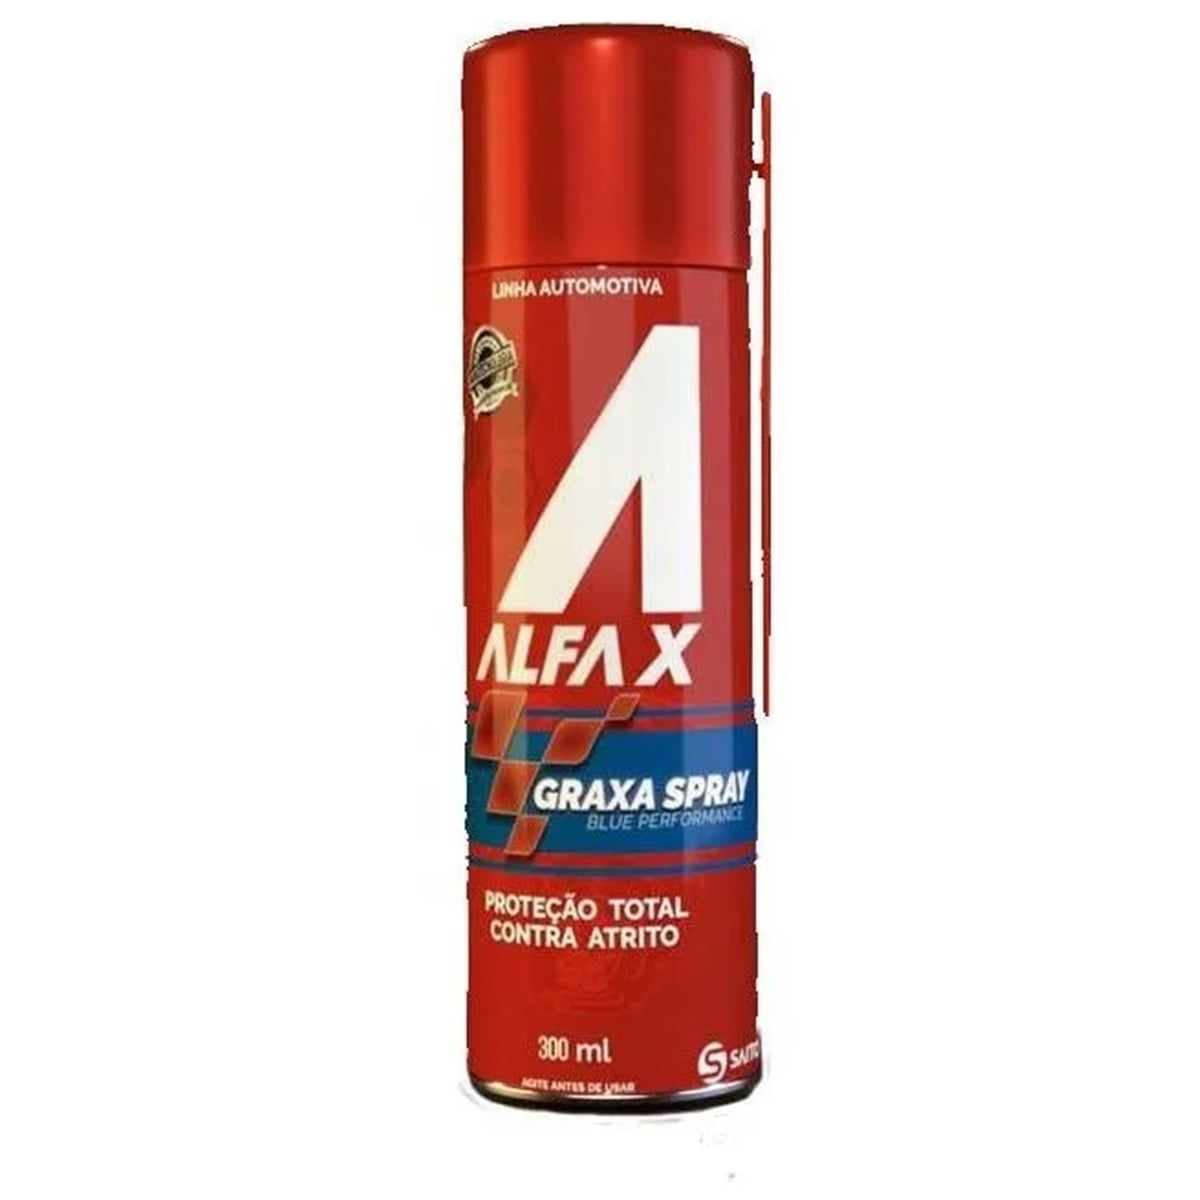 Graxa Alta Performance Alfa-x Ivory Ep2 Spray 300ml